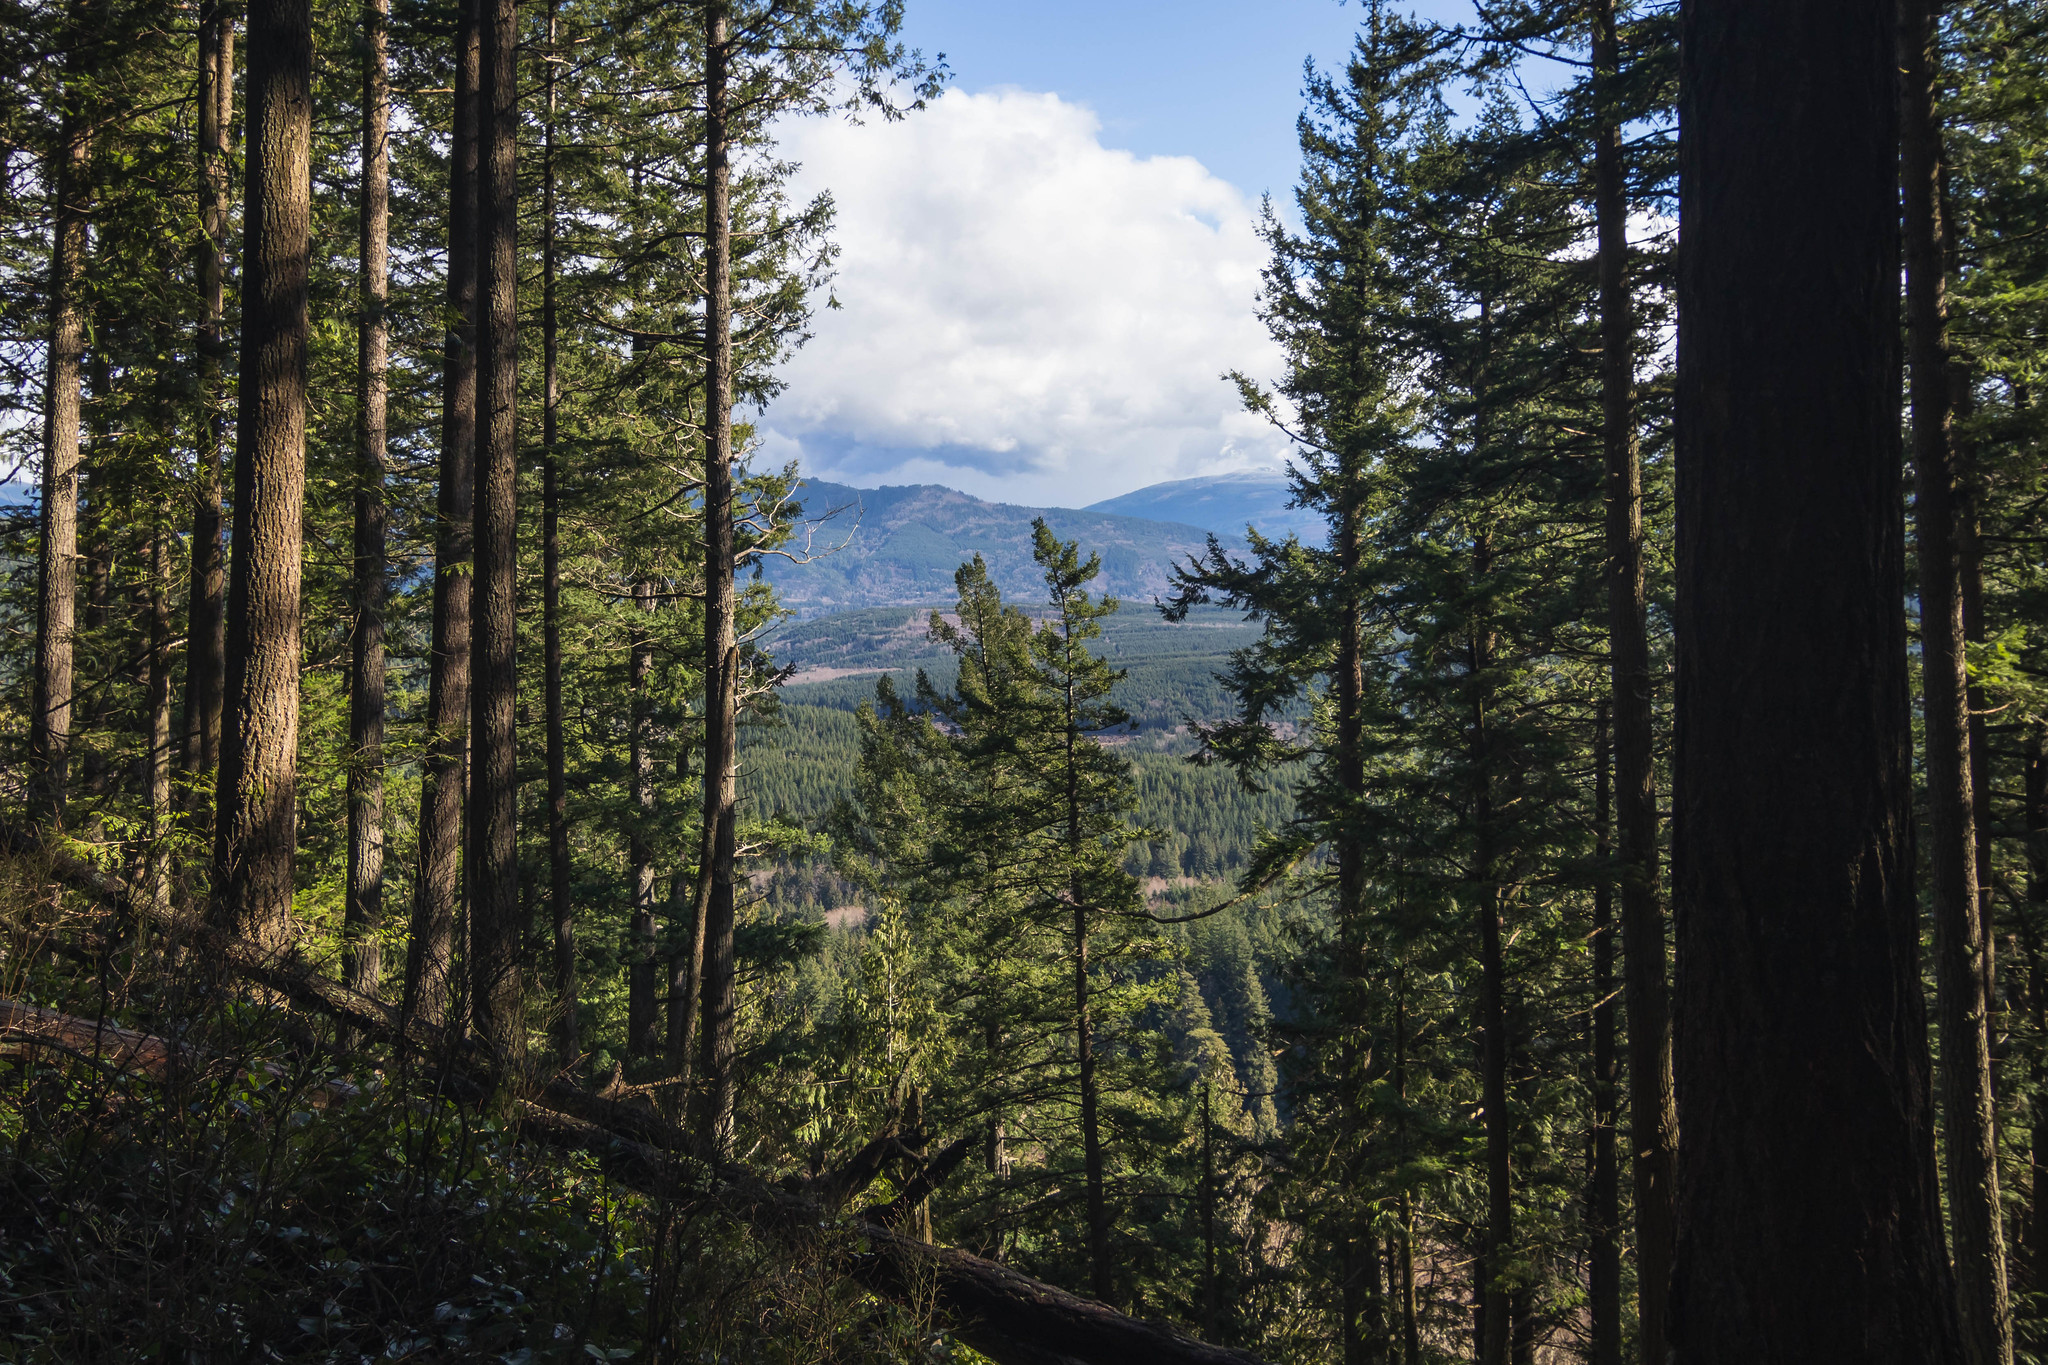 Some views on Chucknut Mountain